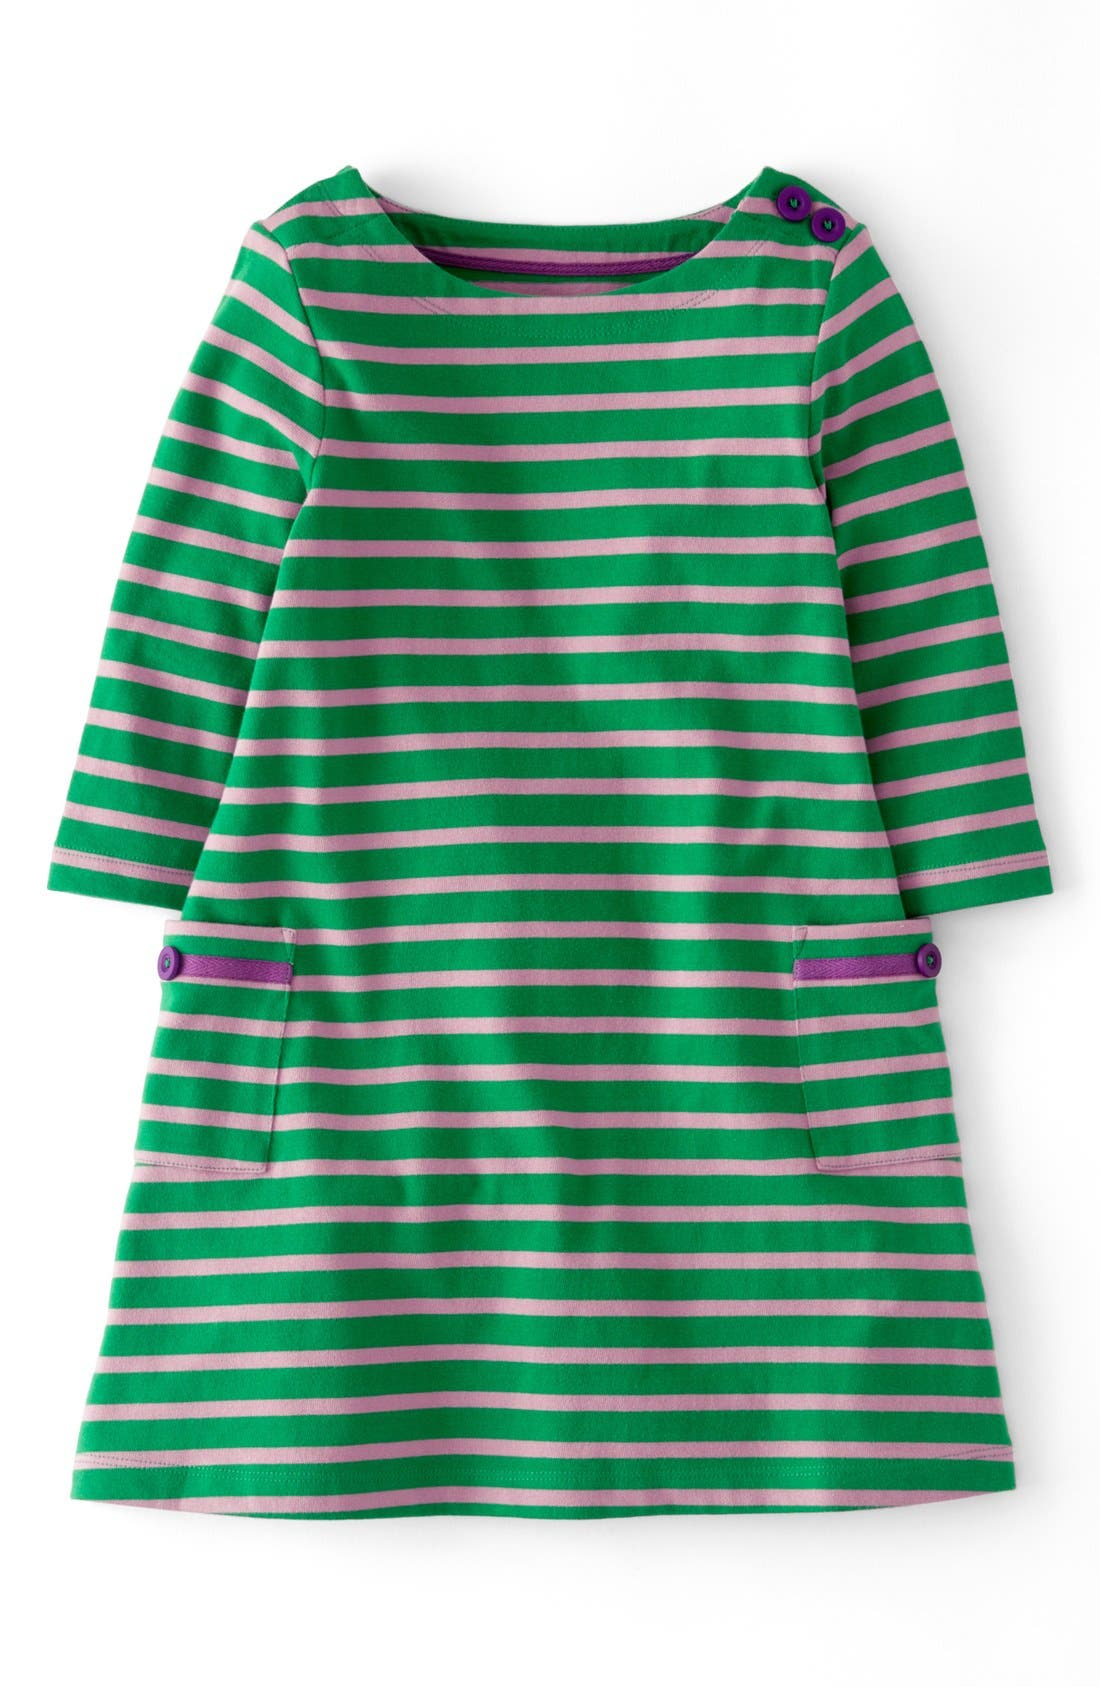 Main Image - Mini Boden Stripy Boatneck Dress (Toddler Girls, Little Girls & Big Girls)(Online Only)